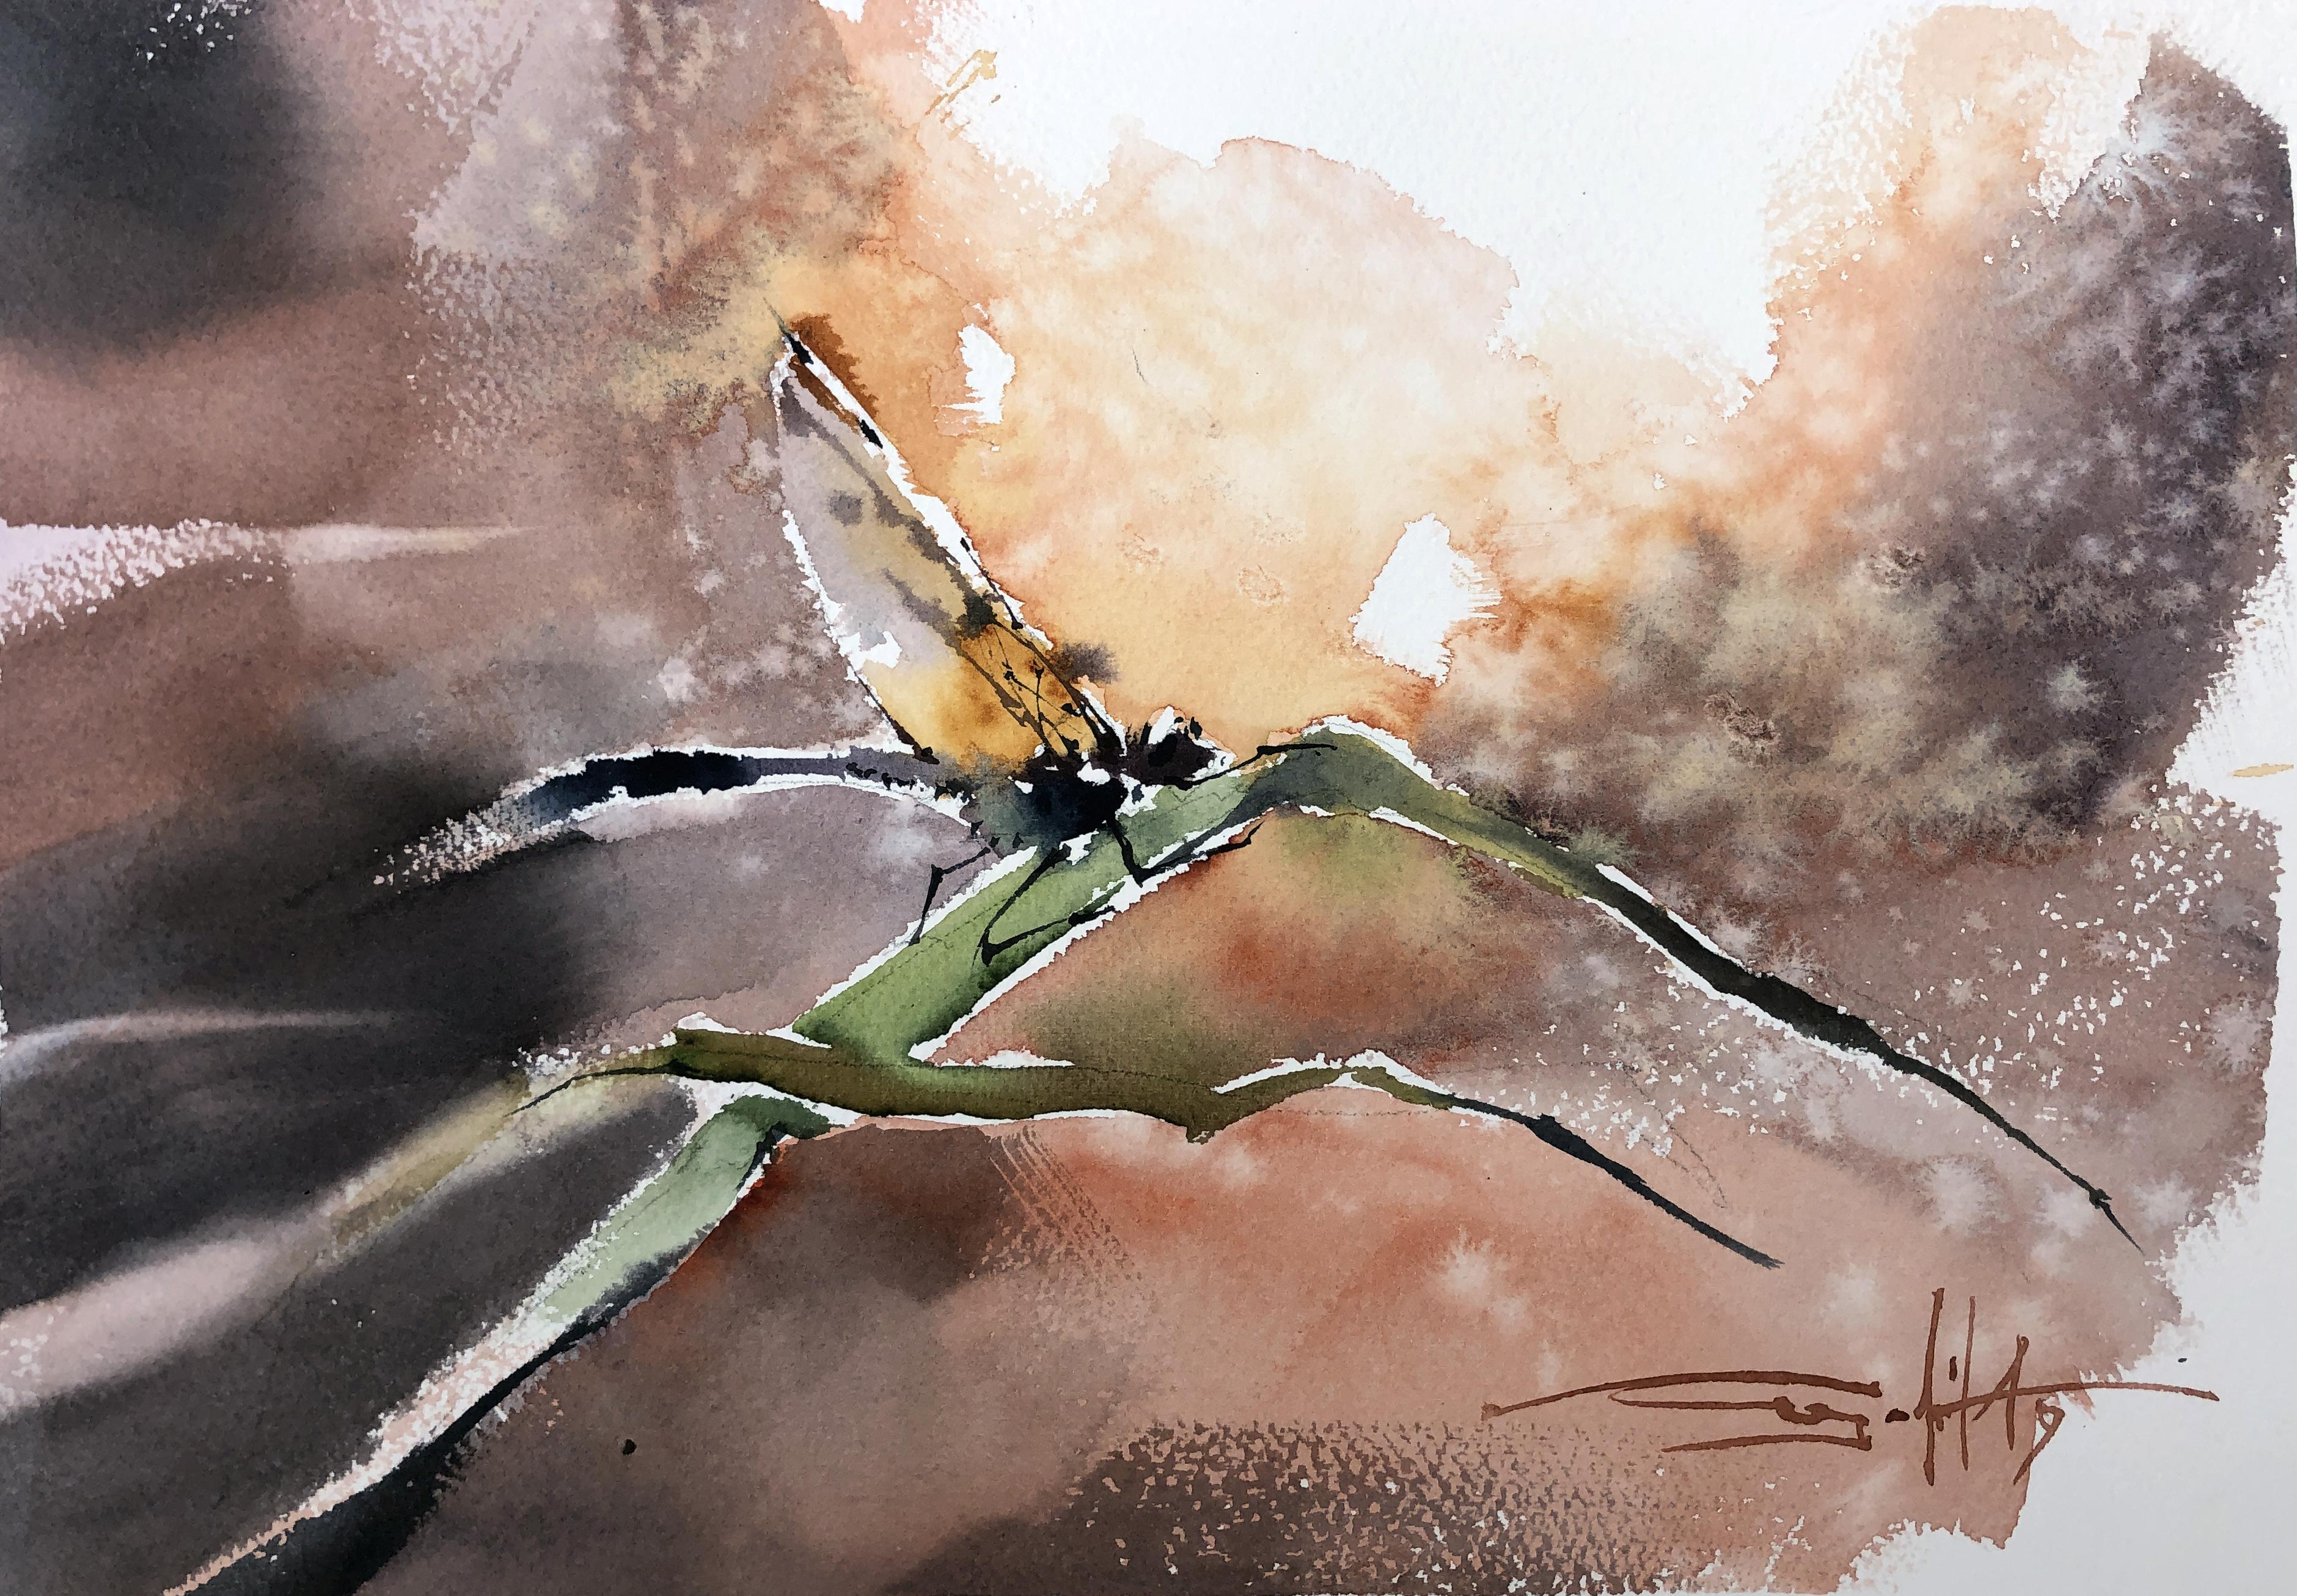 #28 Dragonfly